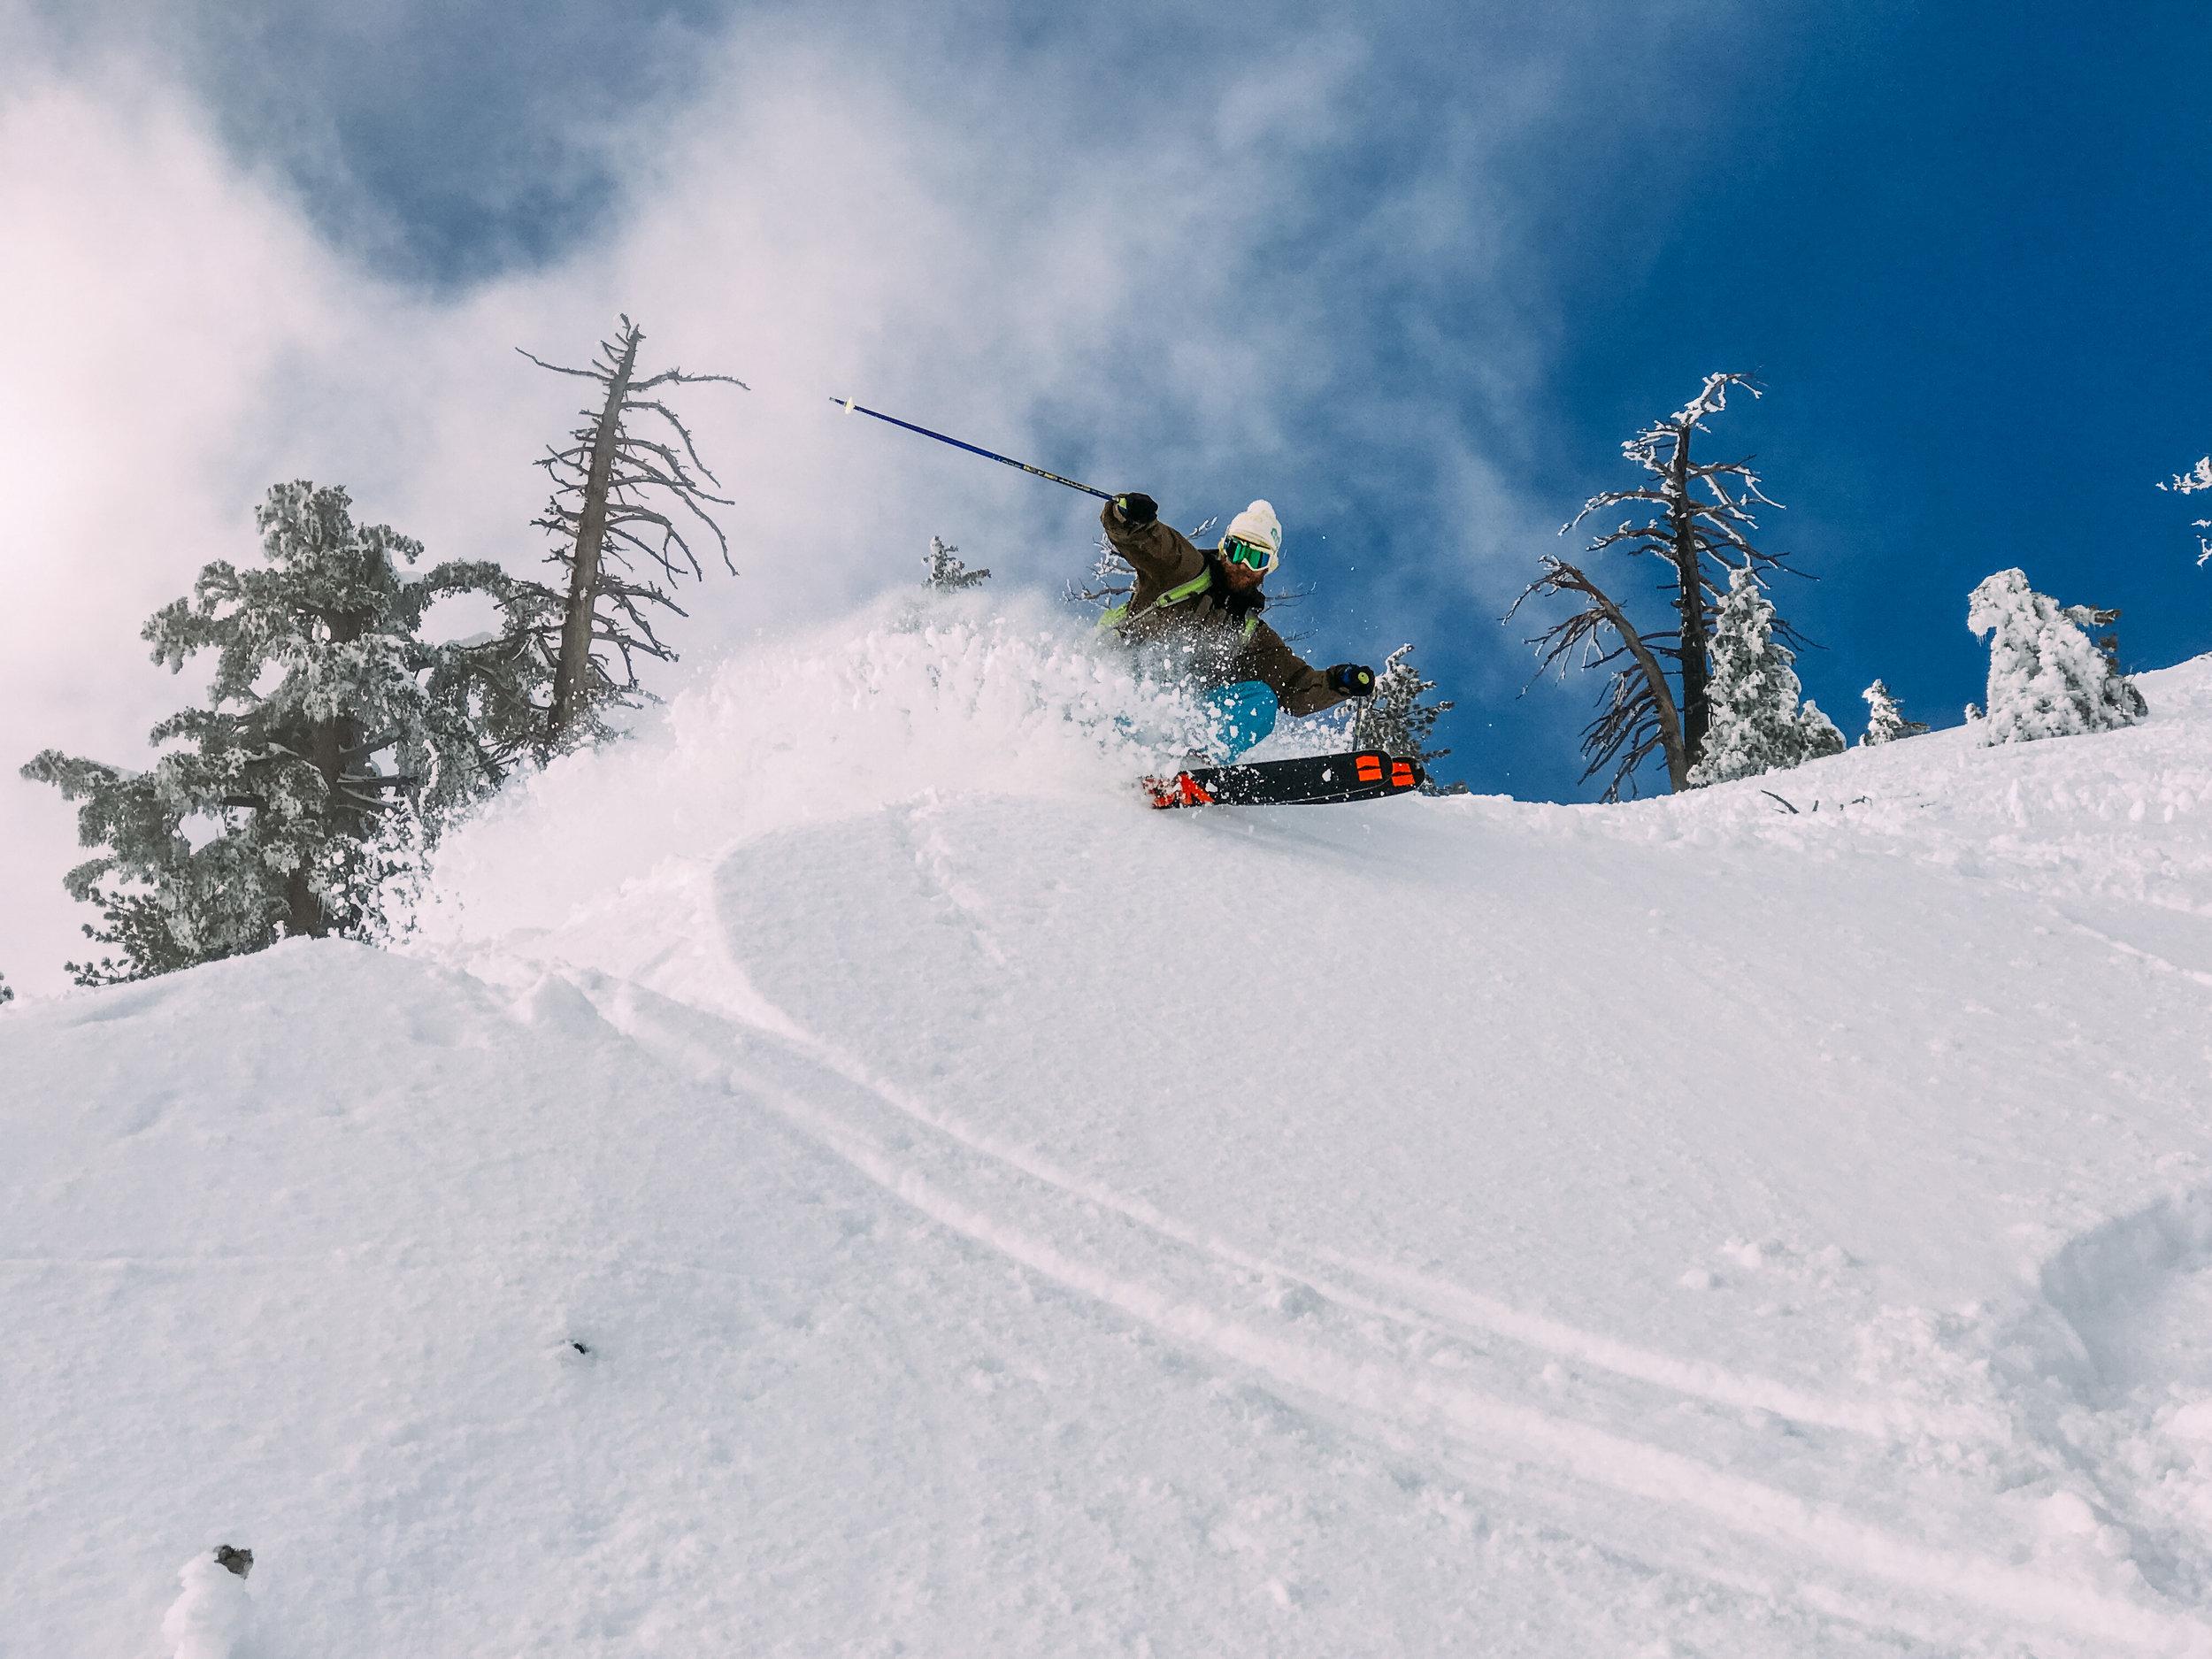 Skiing Pow on Blackcomb Crystal Zone.